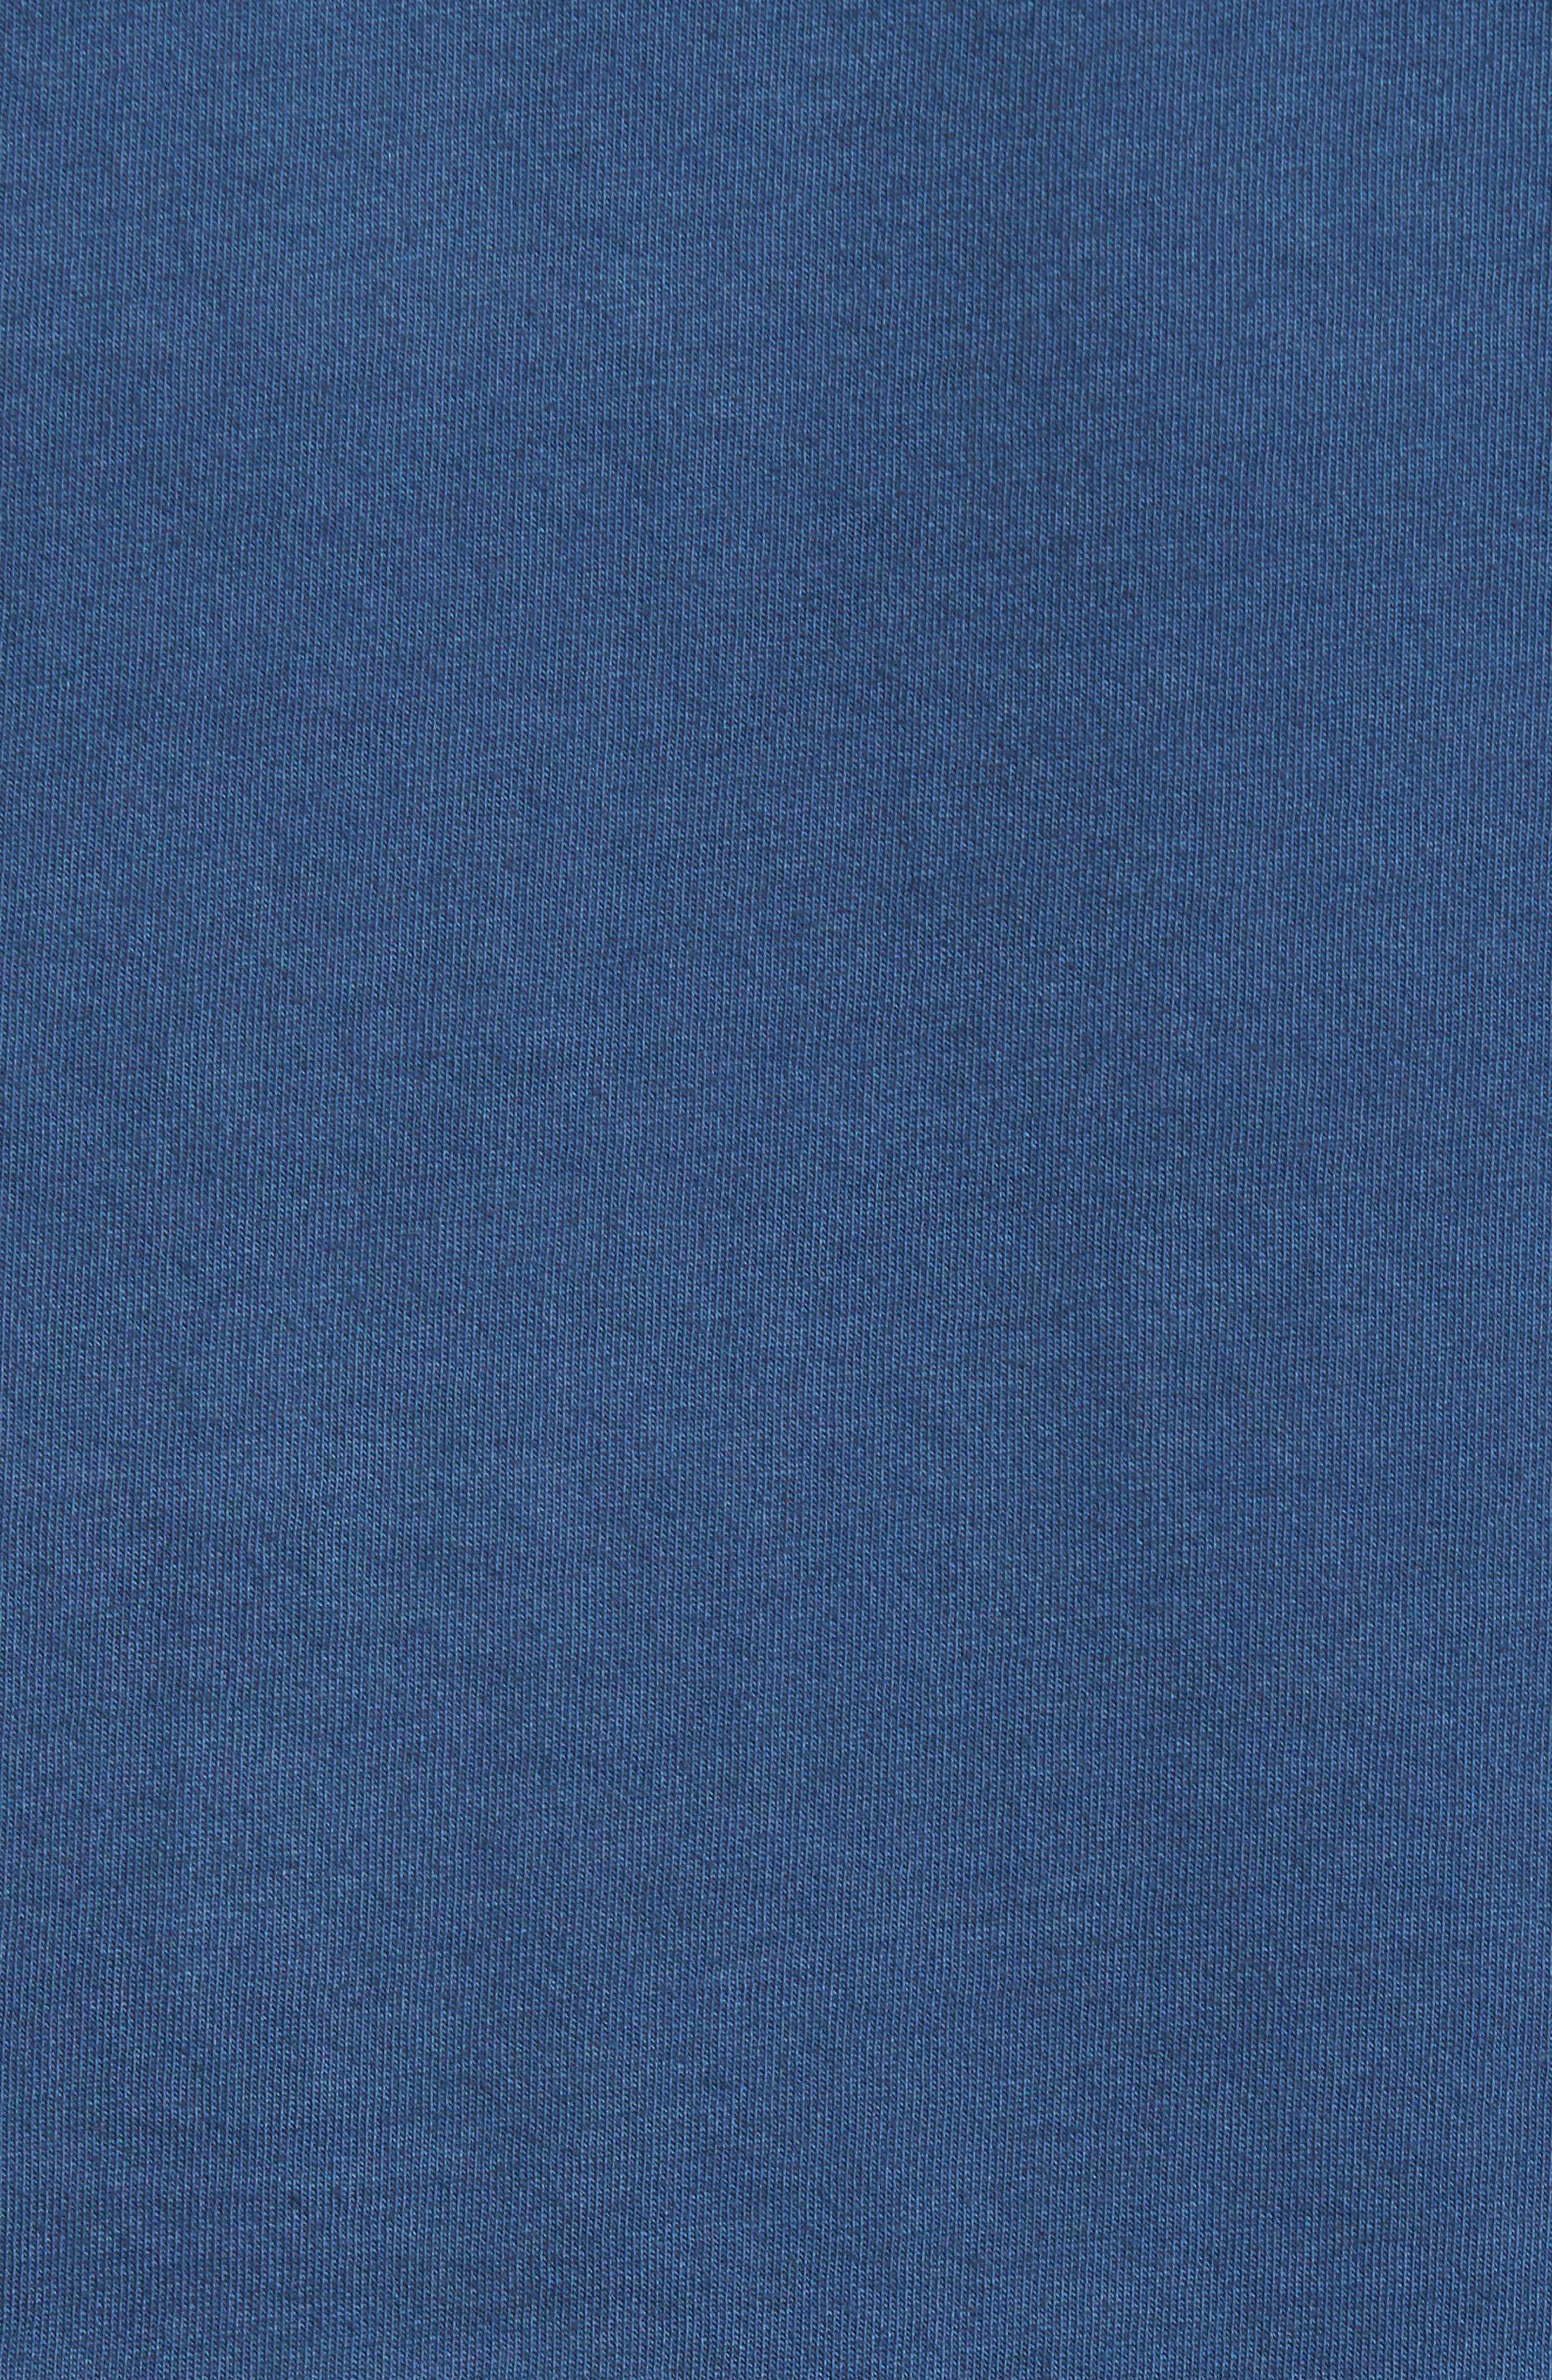 Trademark Diamond T-Shirt,                             Alternate thumbnail 5, color,                             424